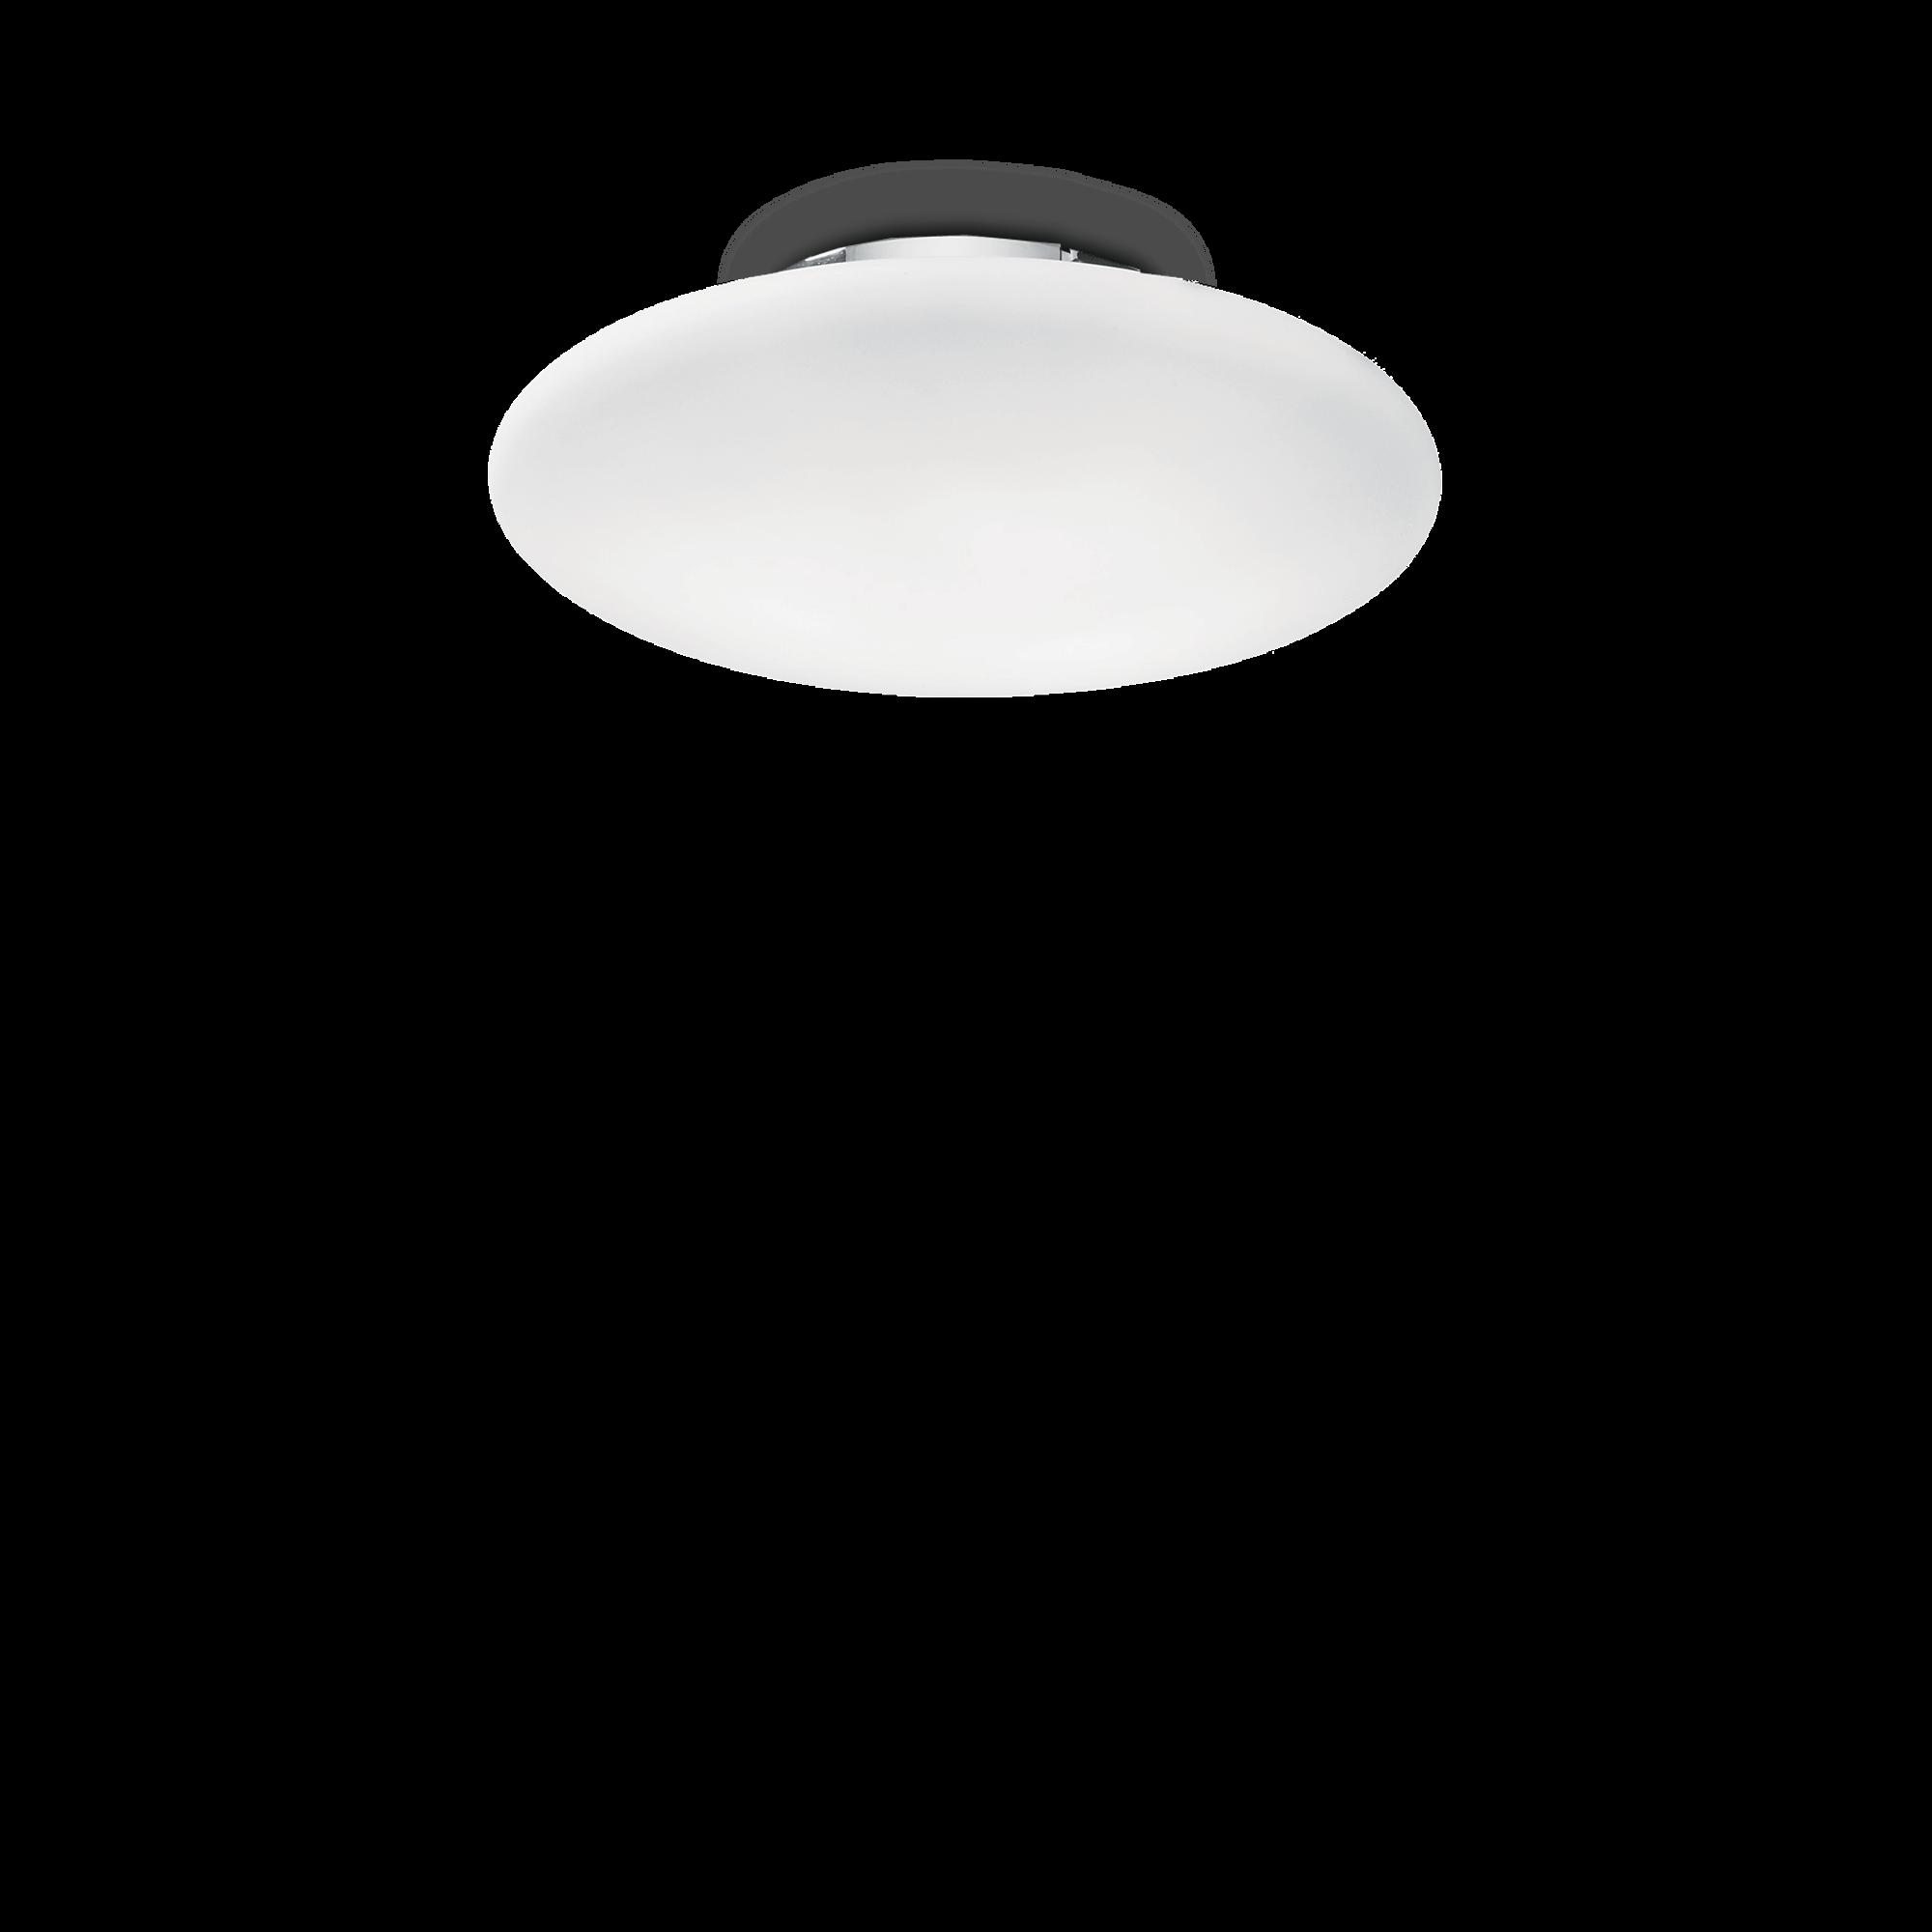 Ideal Lux 009223 Smarties Bianco PL1 D33 modern mennyezeti lámpa